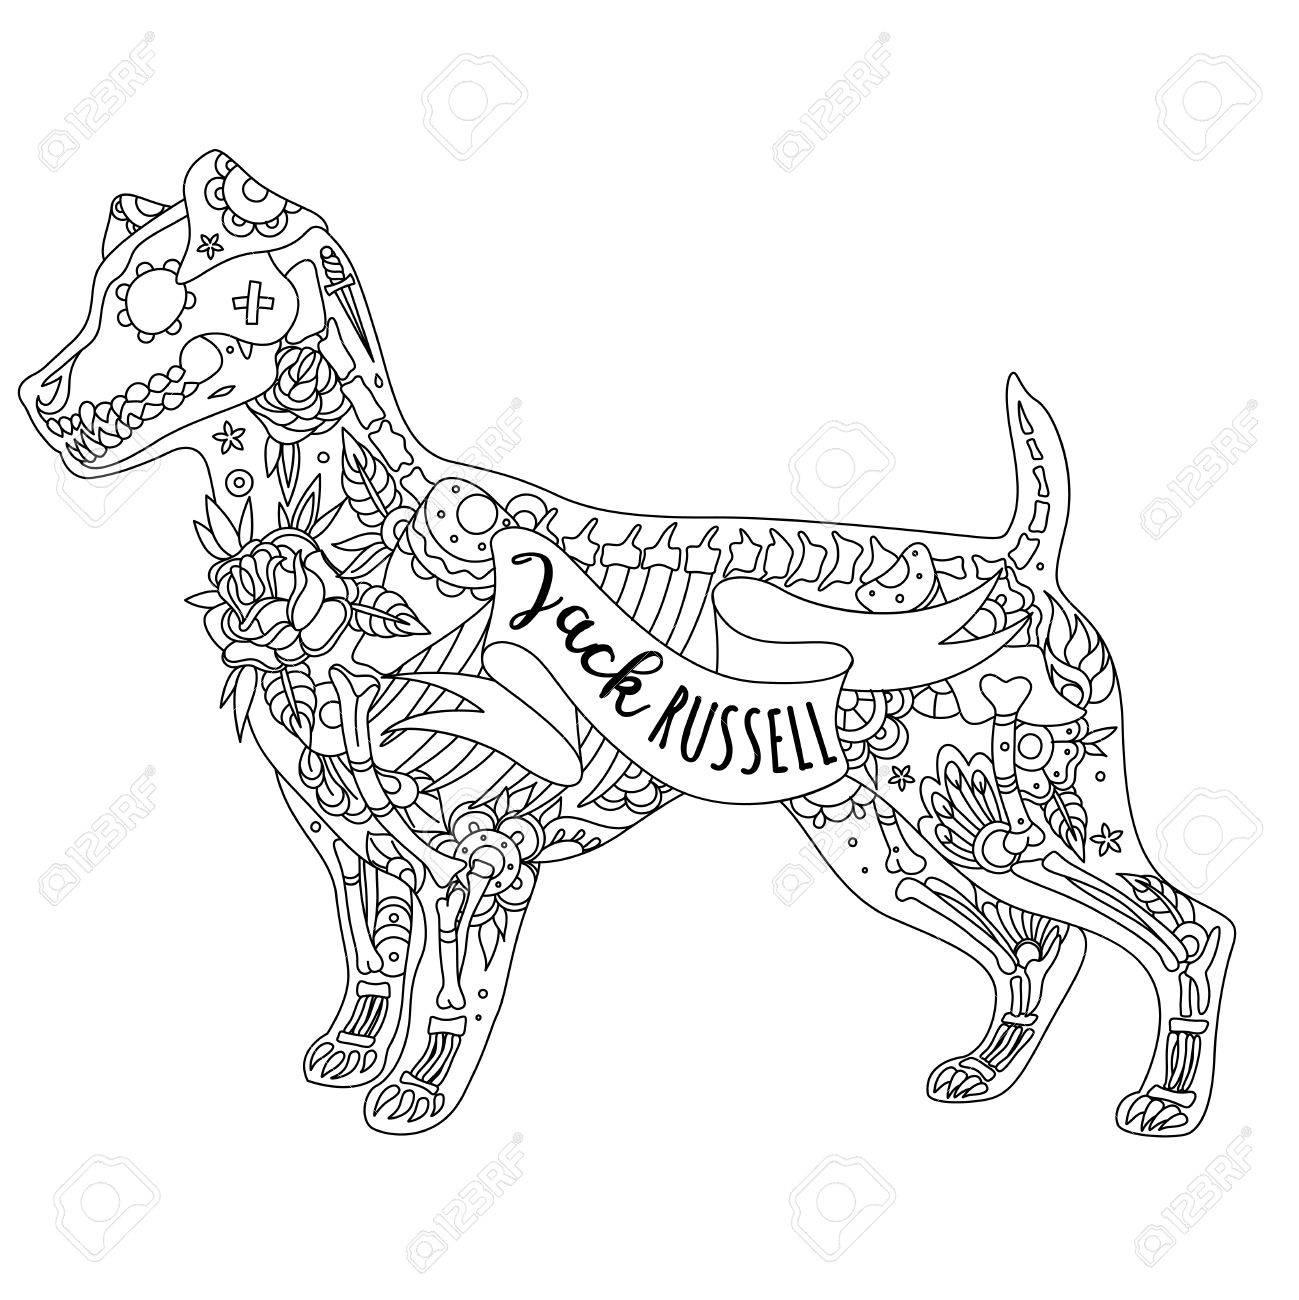 1299x1300 Stylized Skeleton Jack Russell Terrier. Jack Russell Terrier